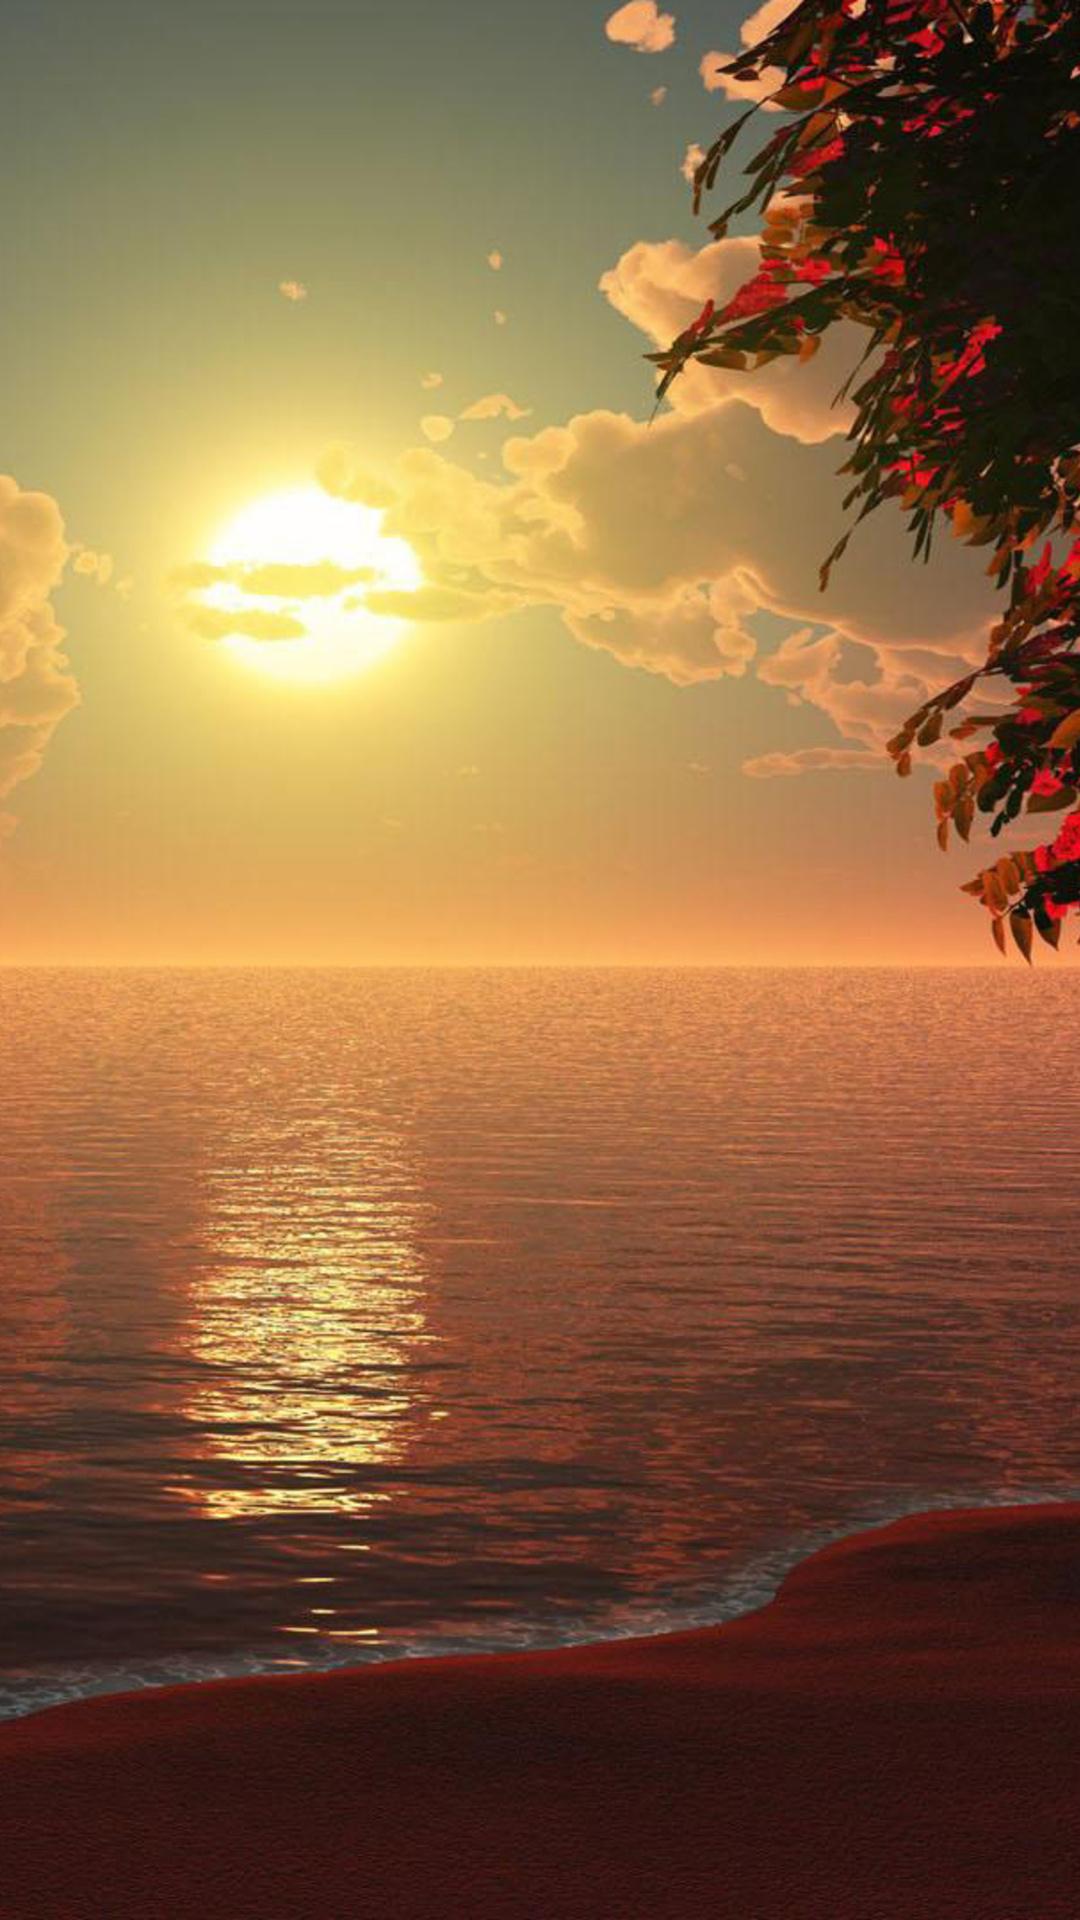 1080x1920 Beautiful Beach Sunset Artwork Iphone 7,6s,6 ...